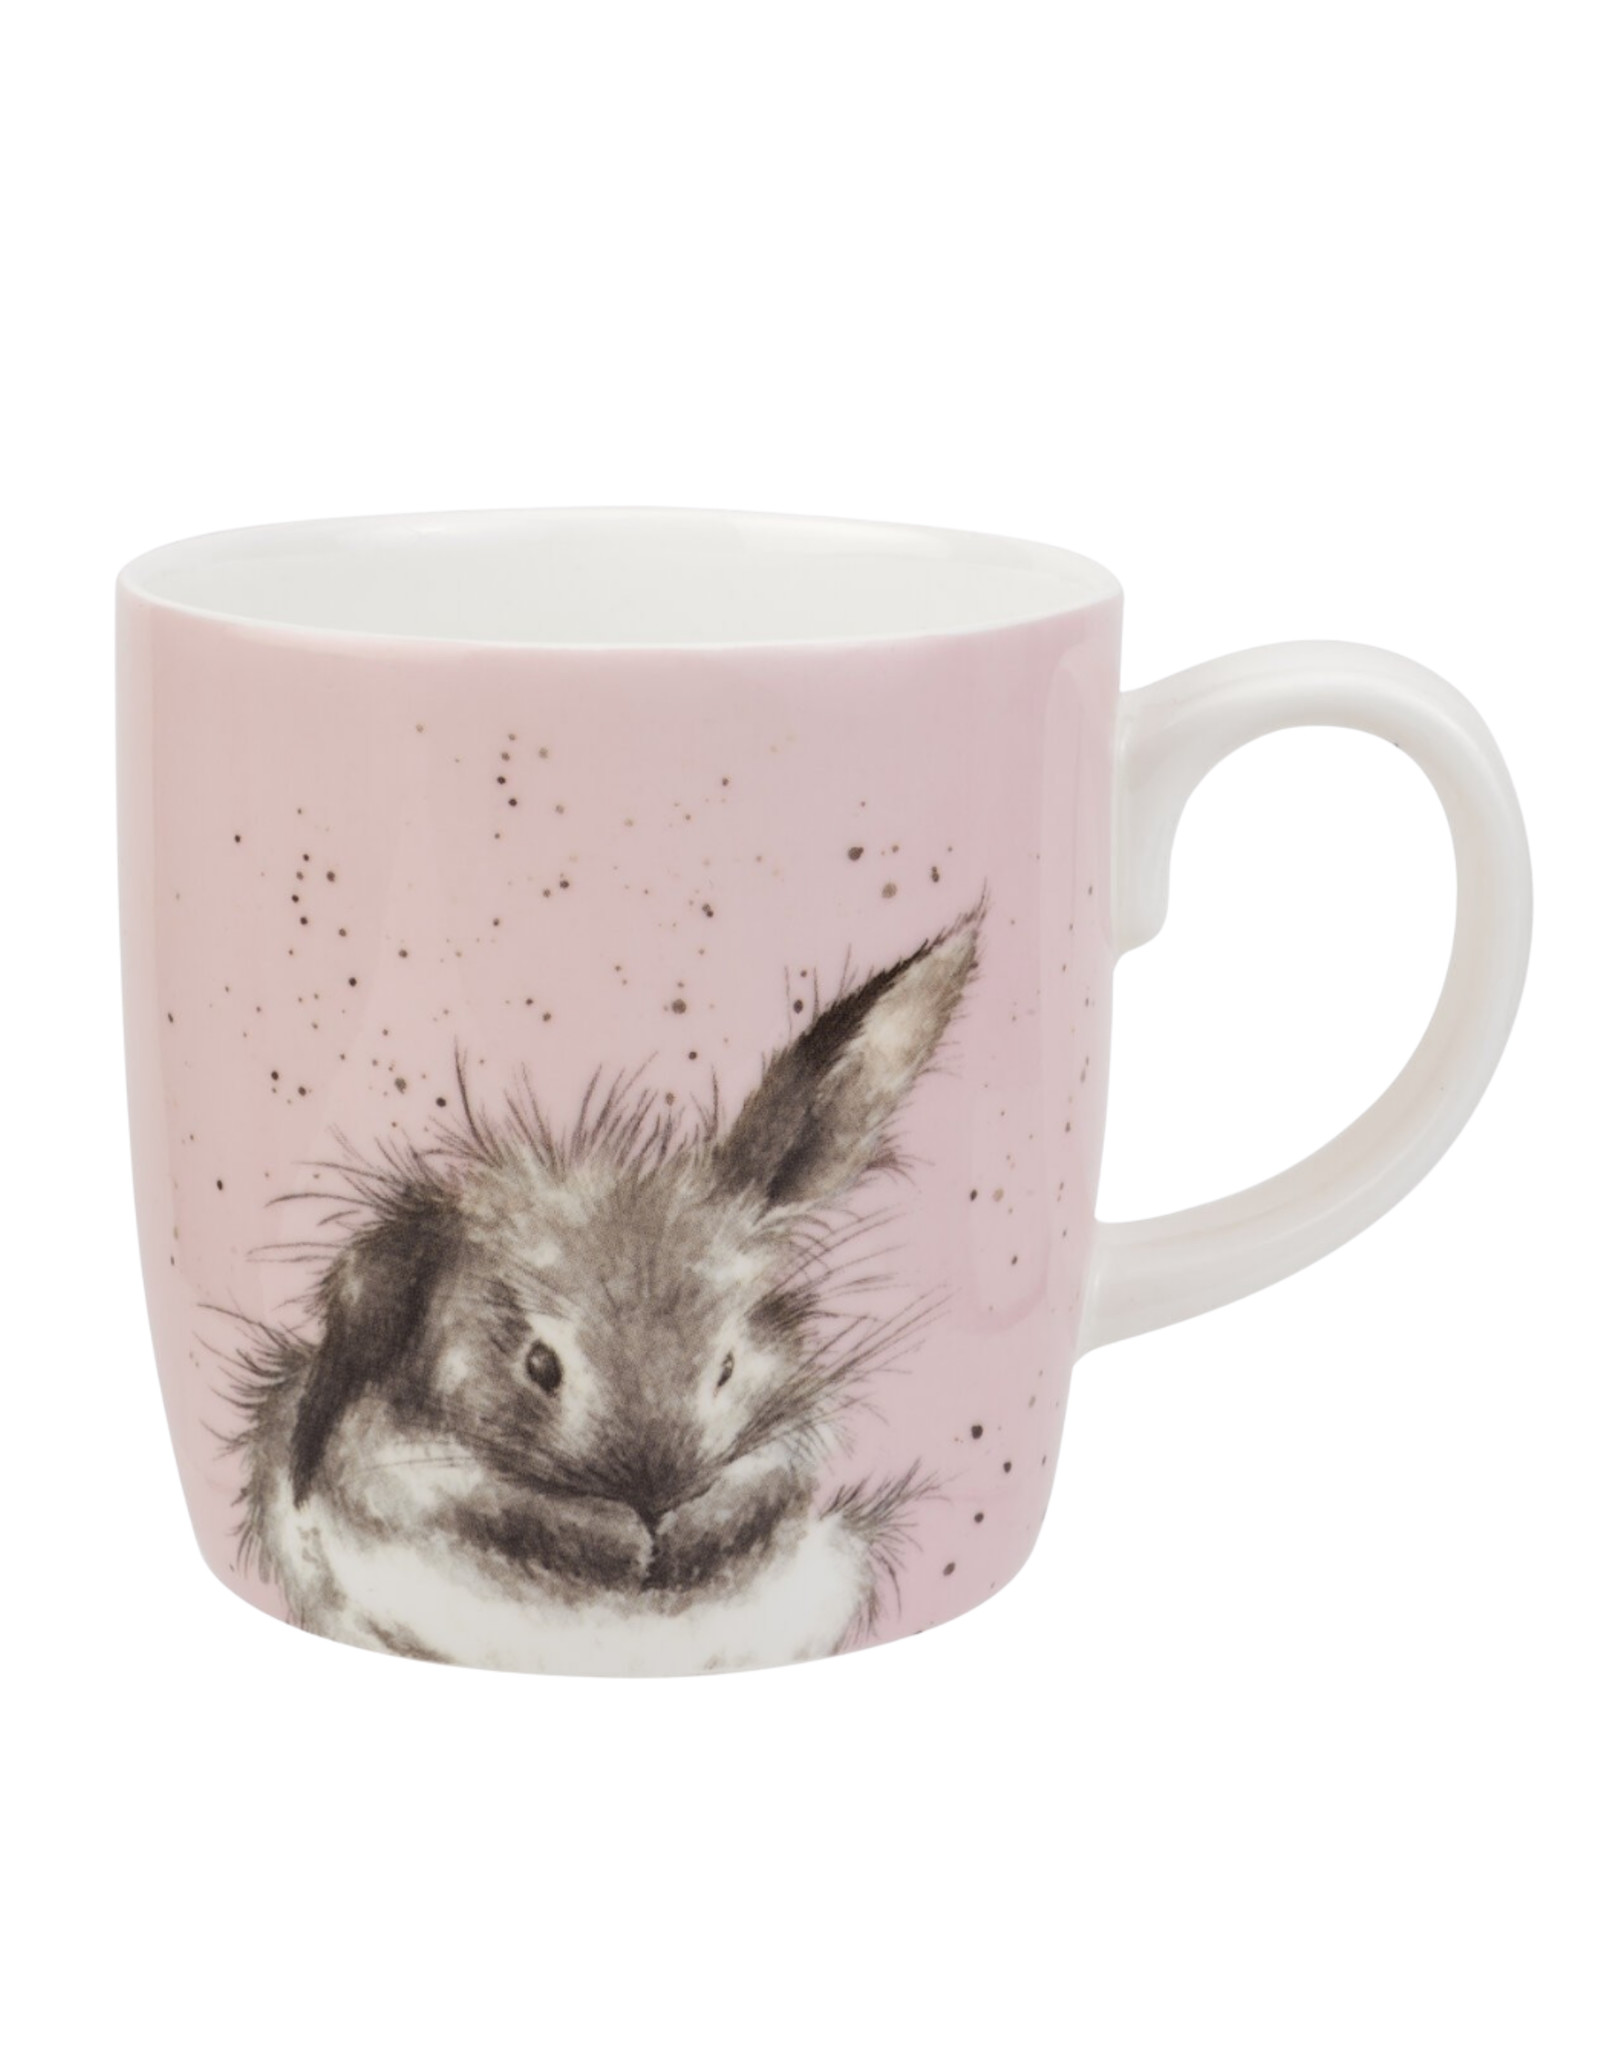 Wrendale Mok Large - Bunny Bath Time